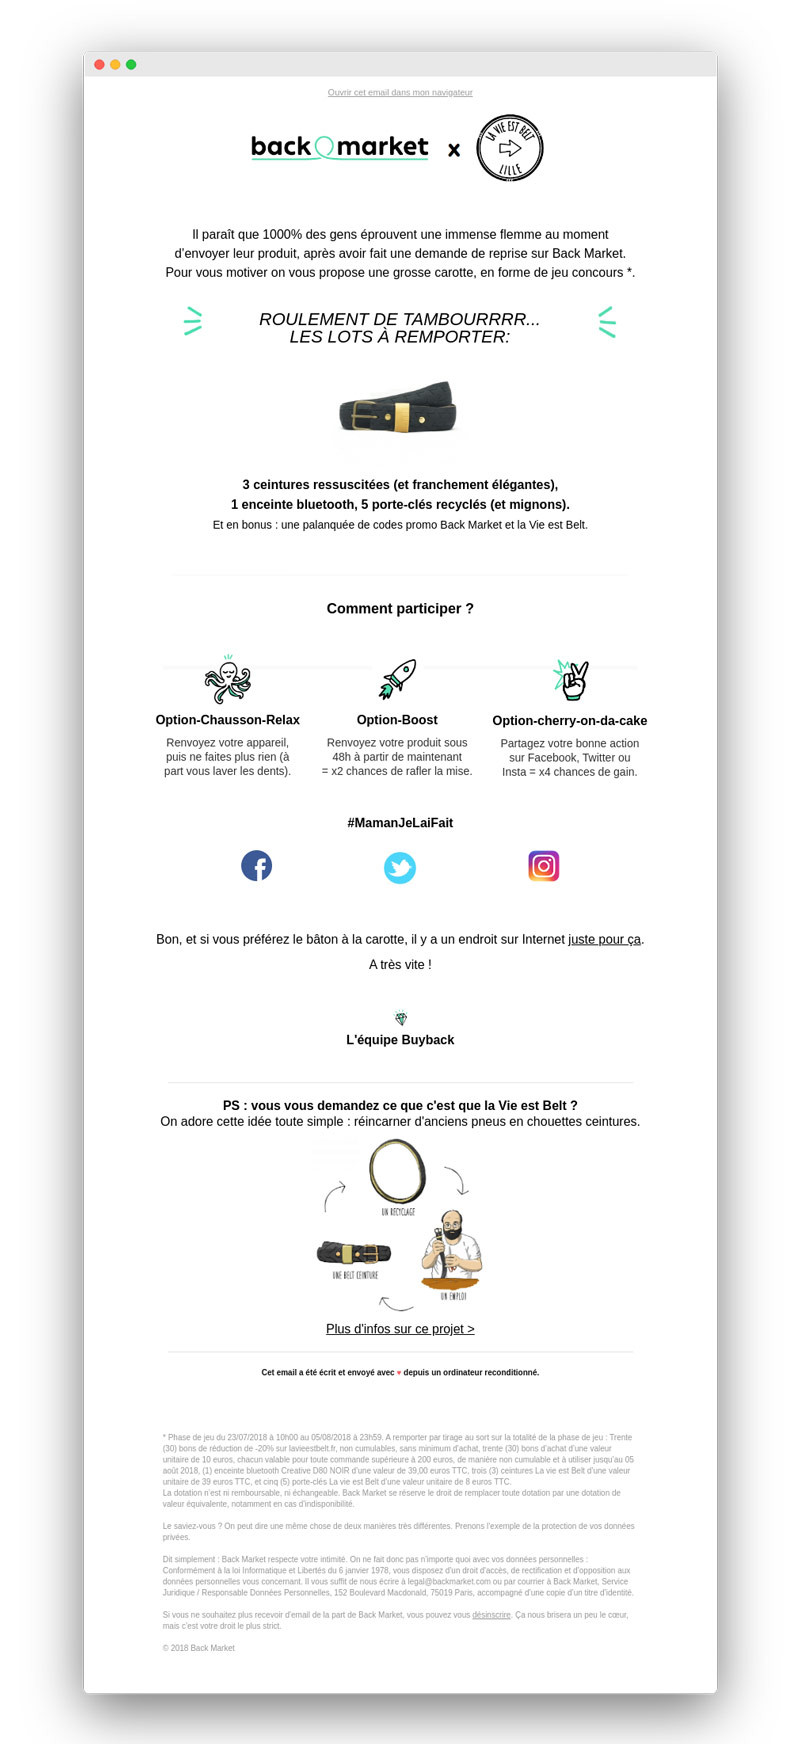 Exemple de newsletter de Back Market avant le rebranding